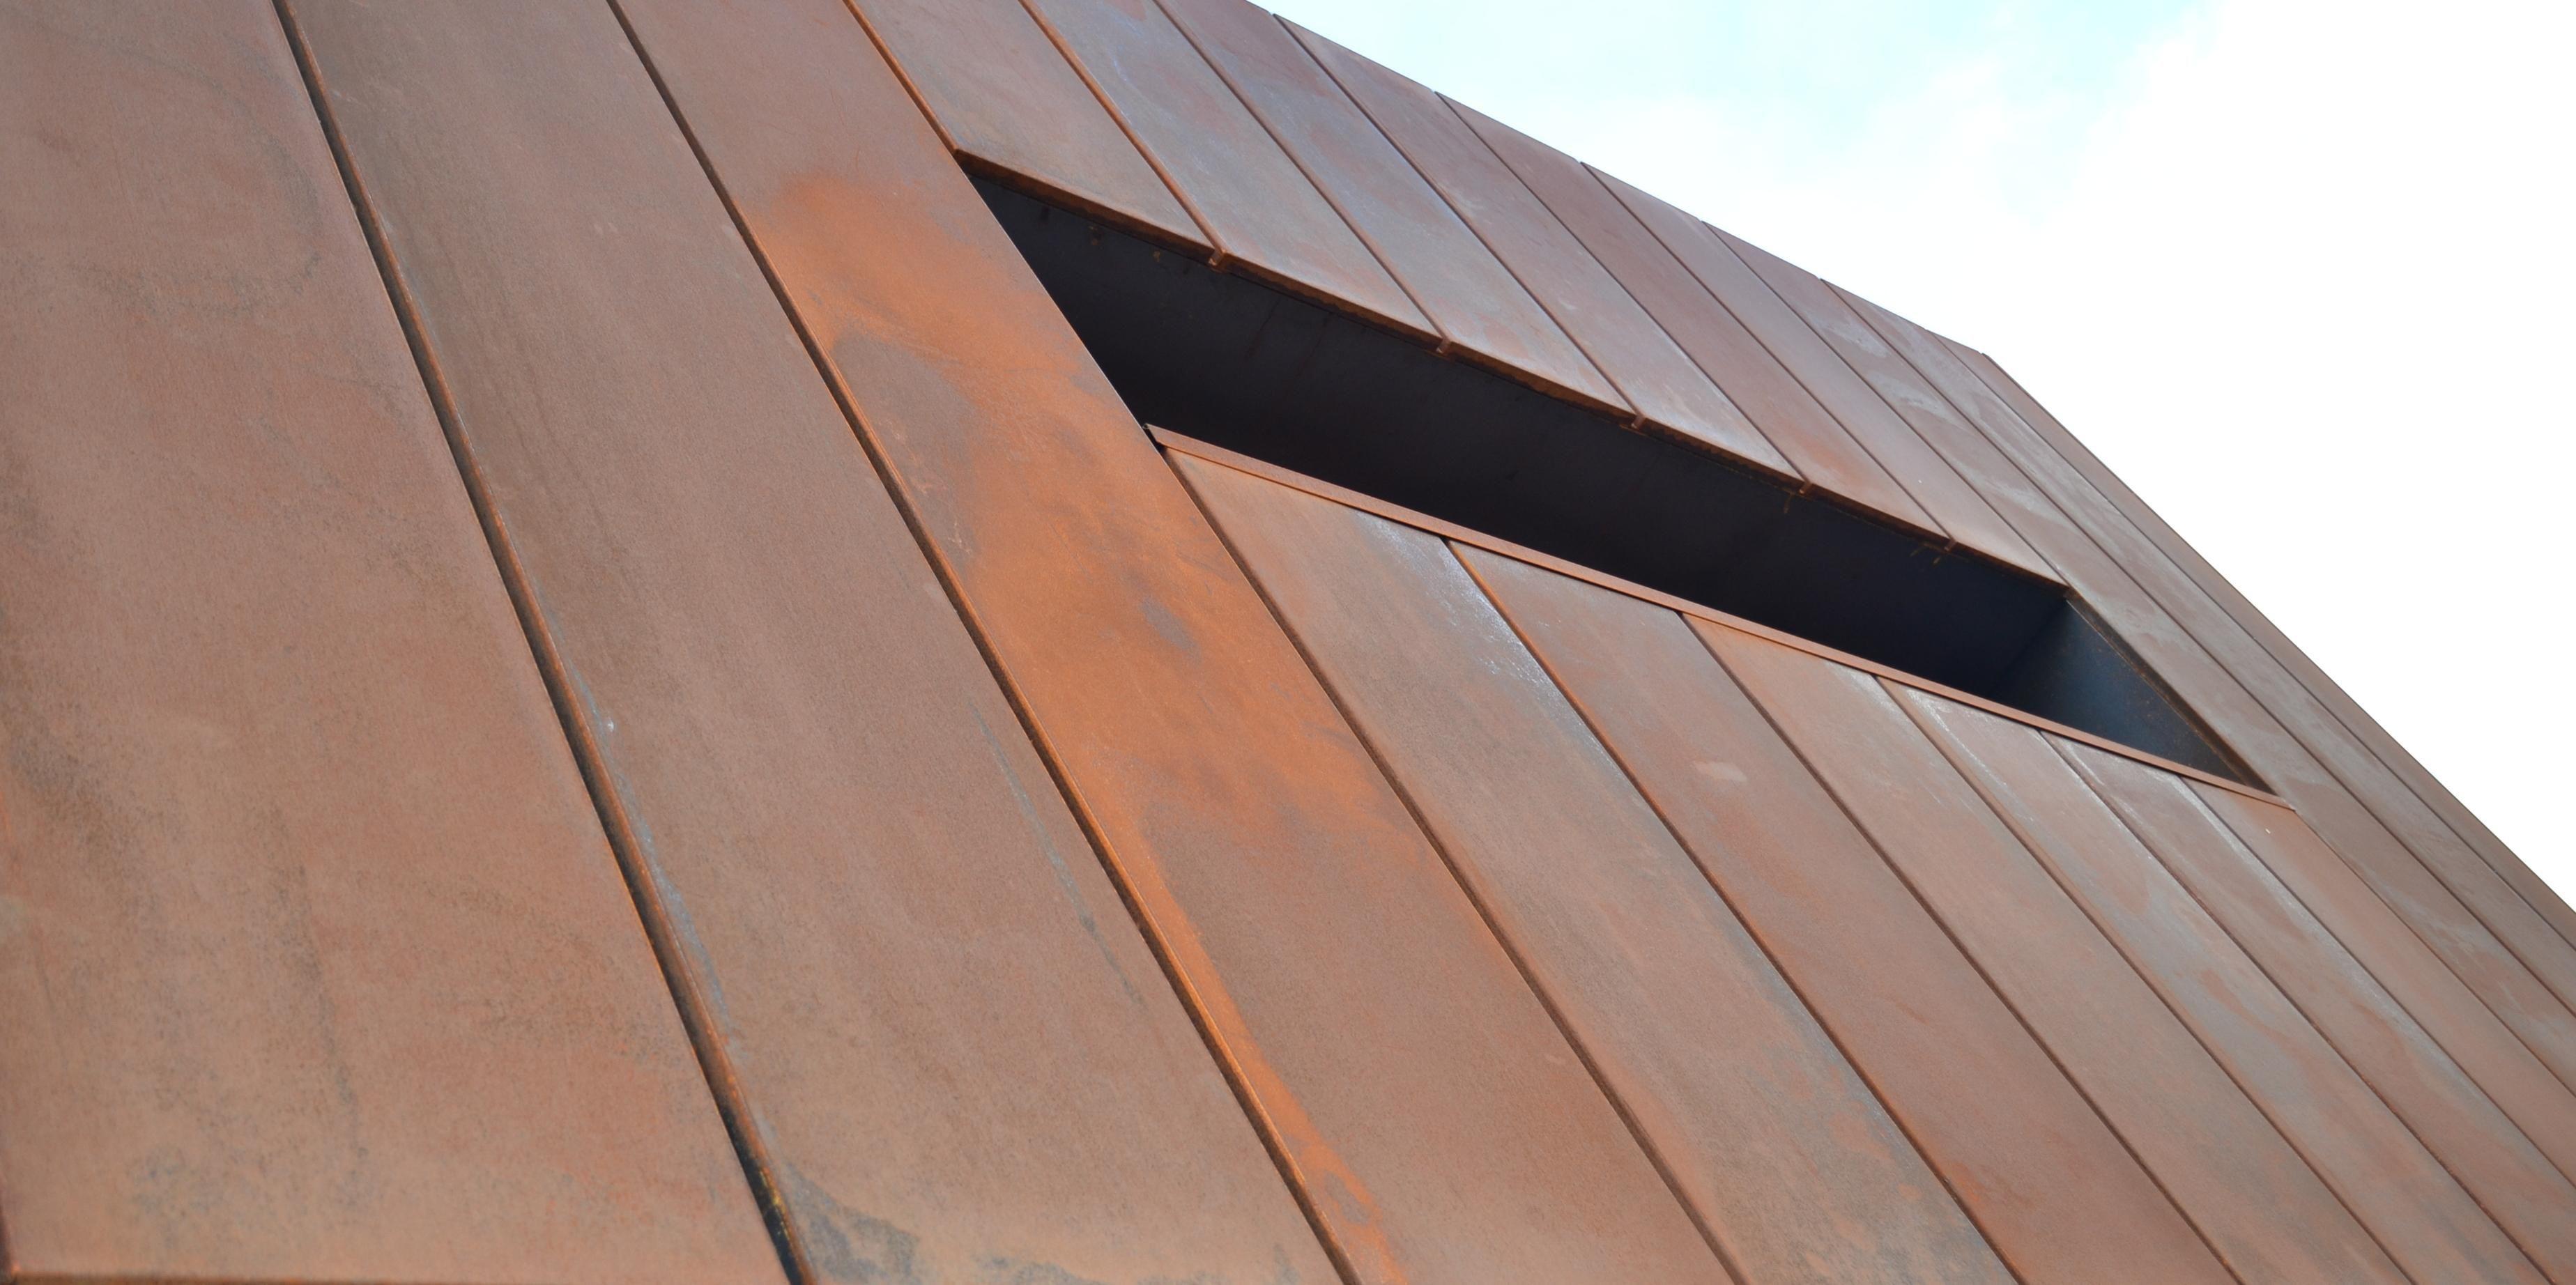 Cassette Panel Copper Wall Cladding Designs Zinc Cladding Copper Design